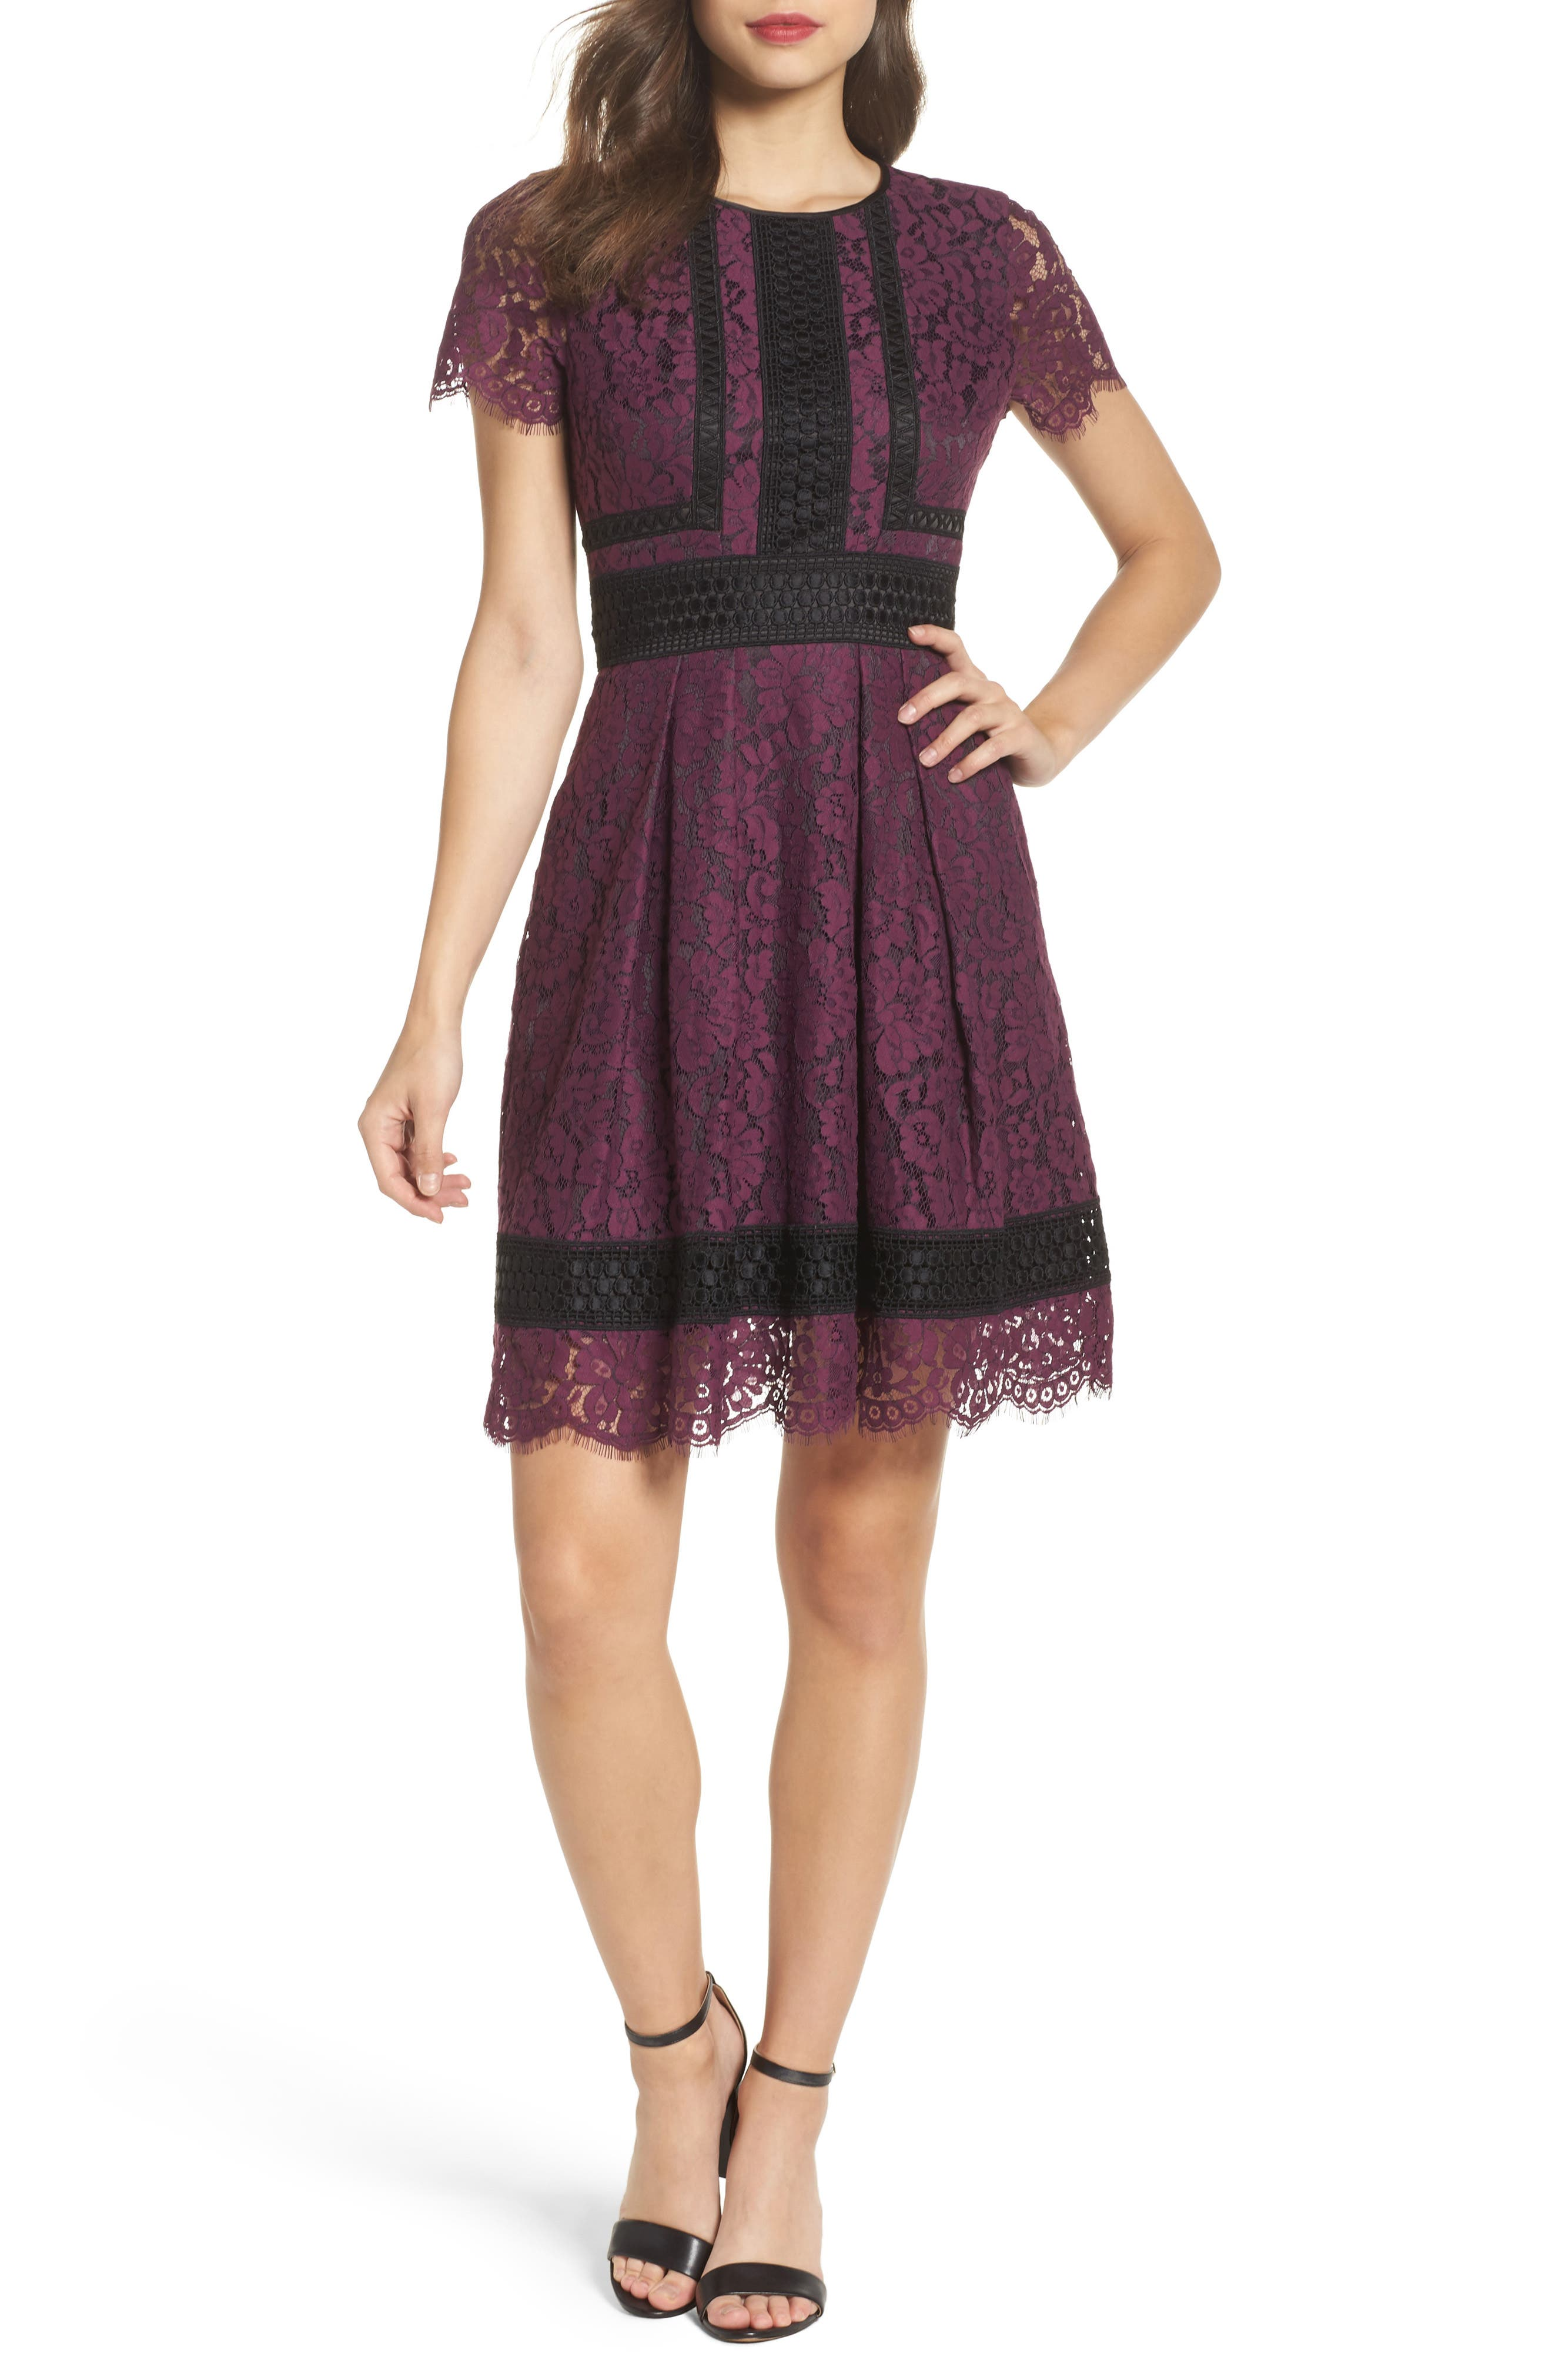 Alternate Image 1 Selected - Eliza J Lace Fit & Flare Dress (Regular & Petite)